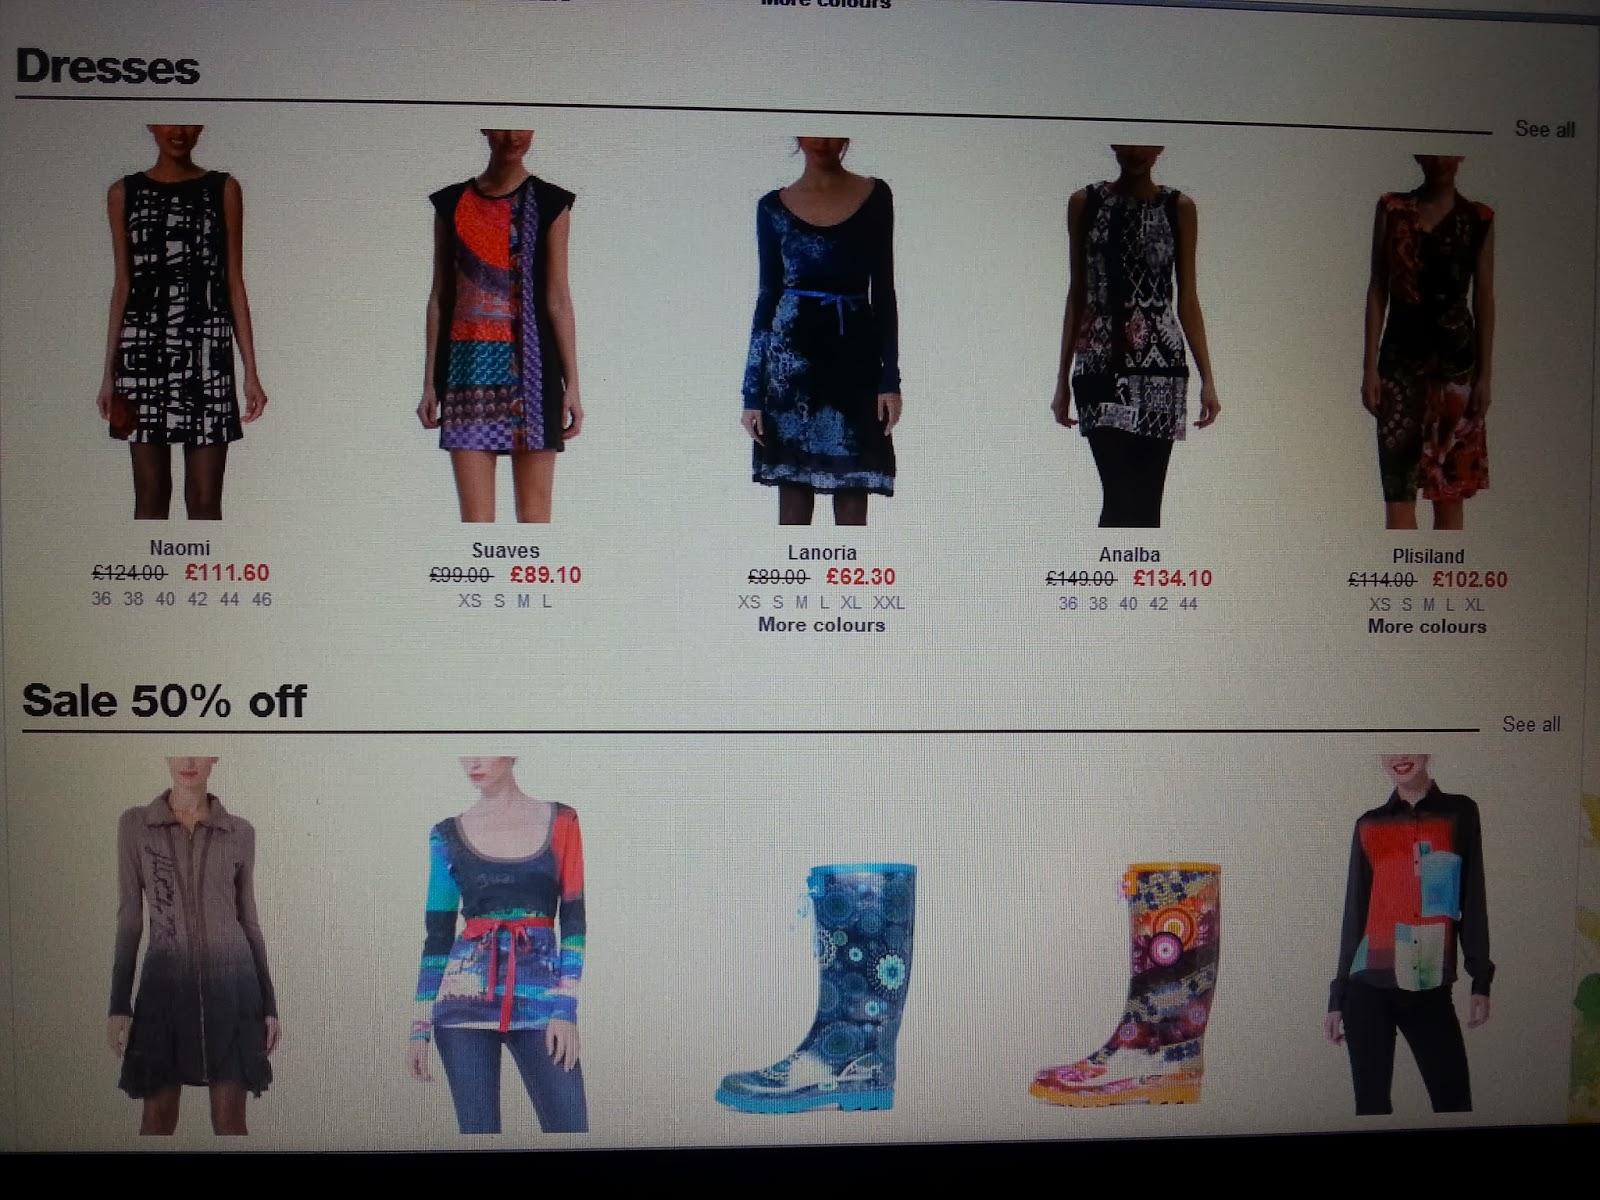 dari sudut pandang, koleksi pakaian Desigual